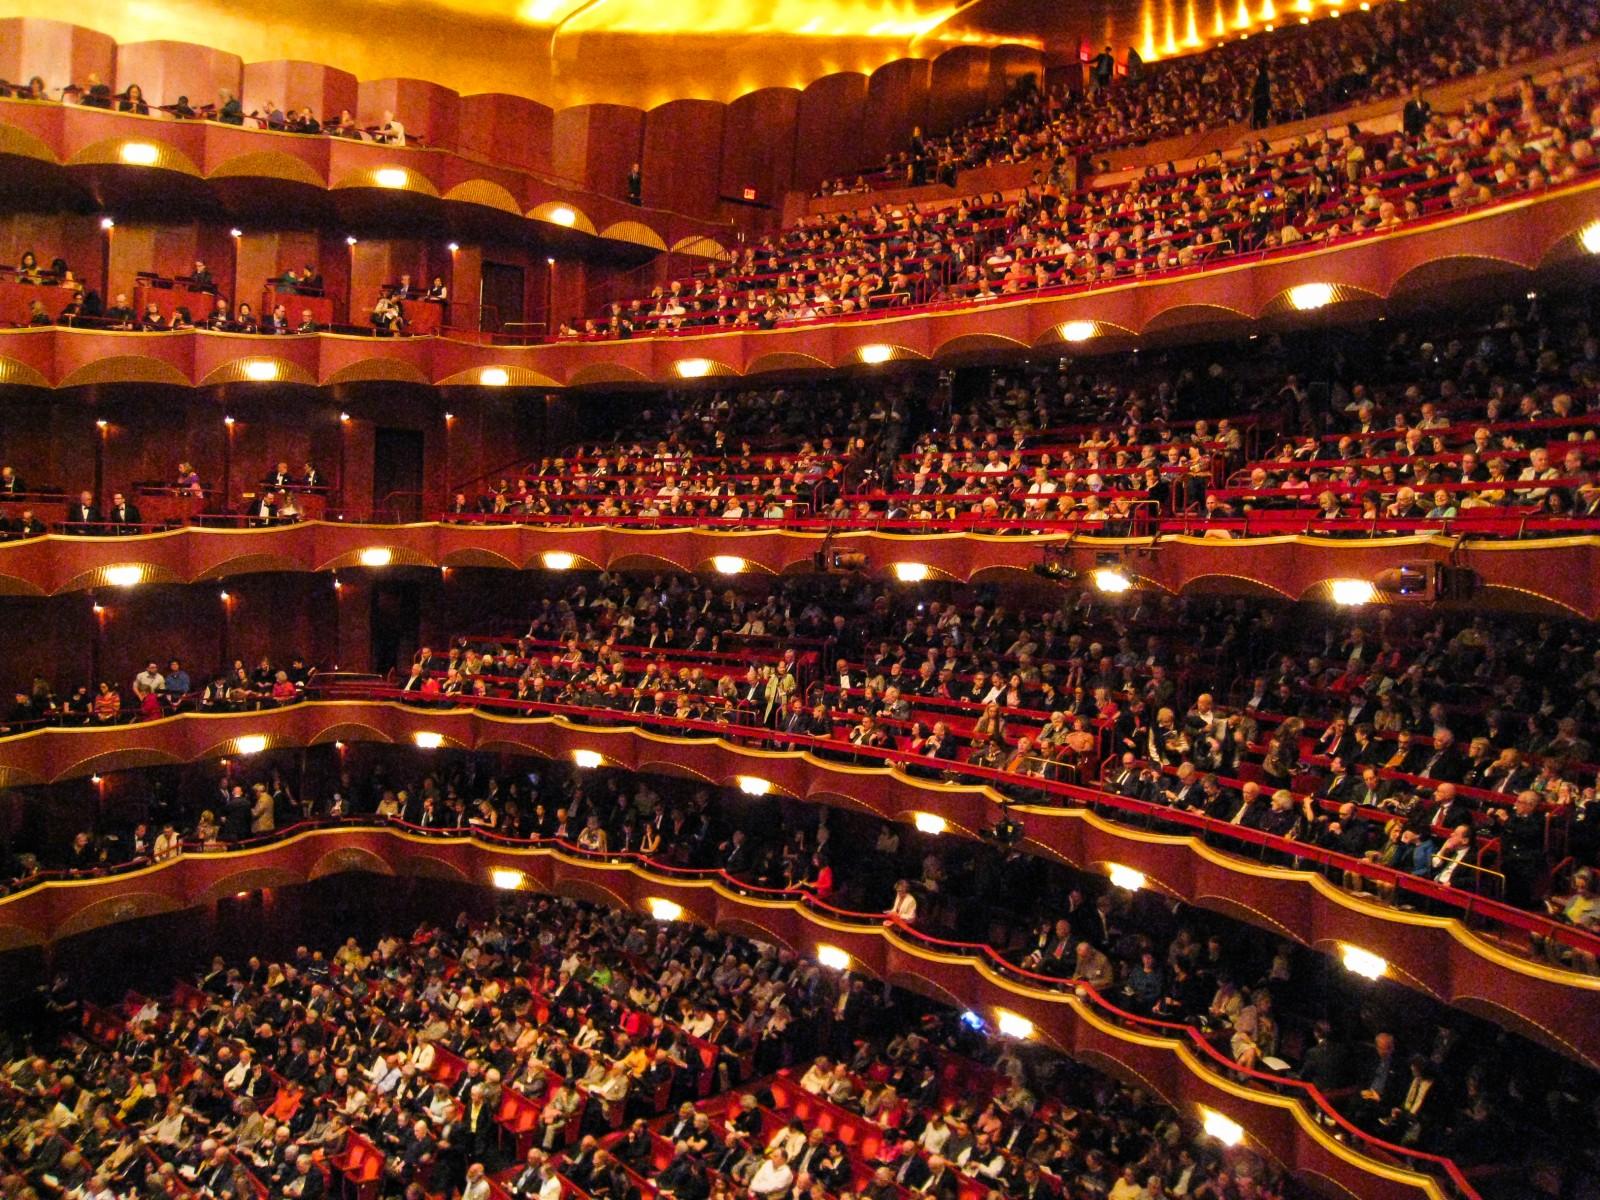 ny2014-metropolitan-opera-44-of-54-e1399301279634